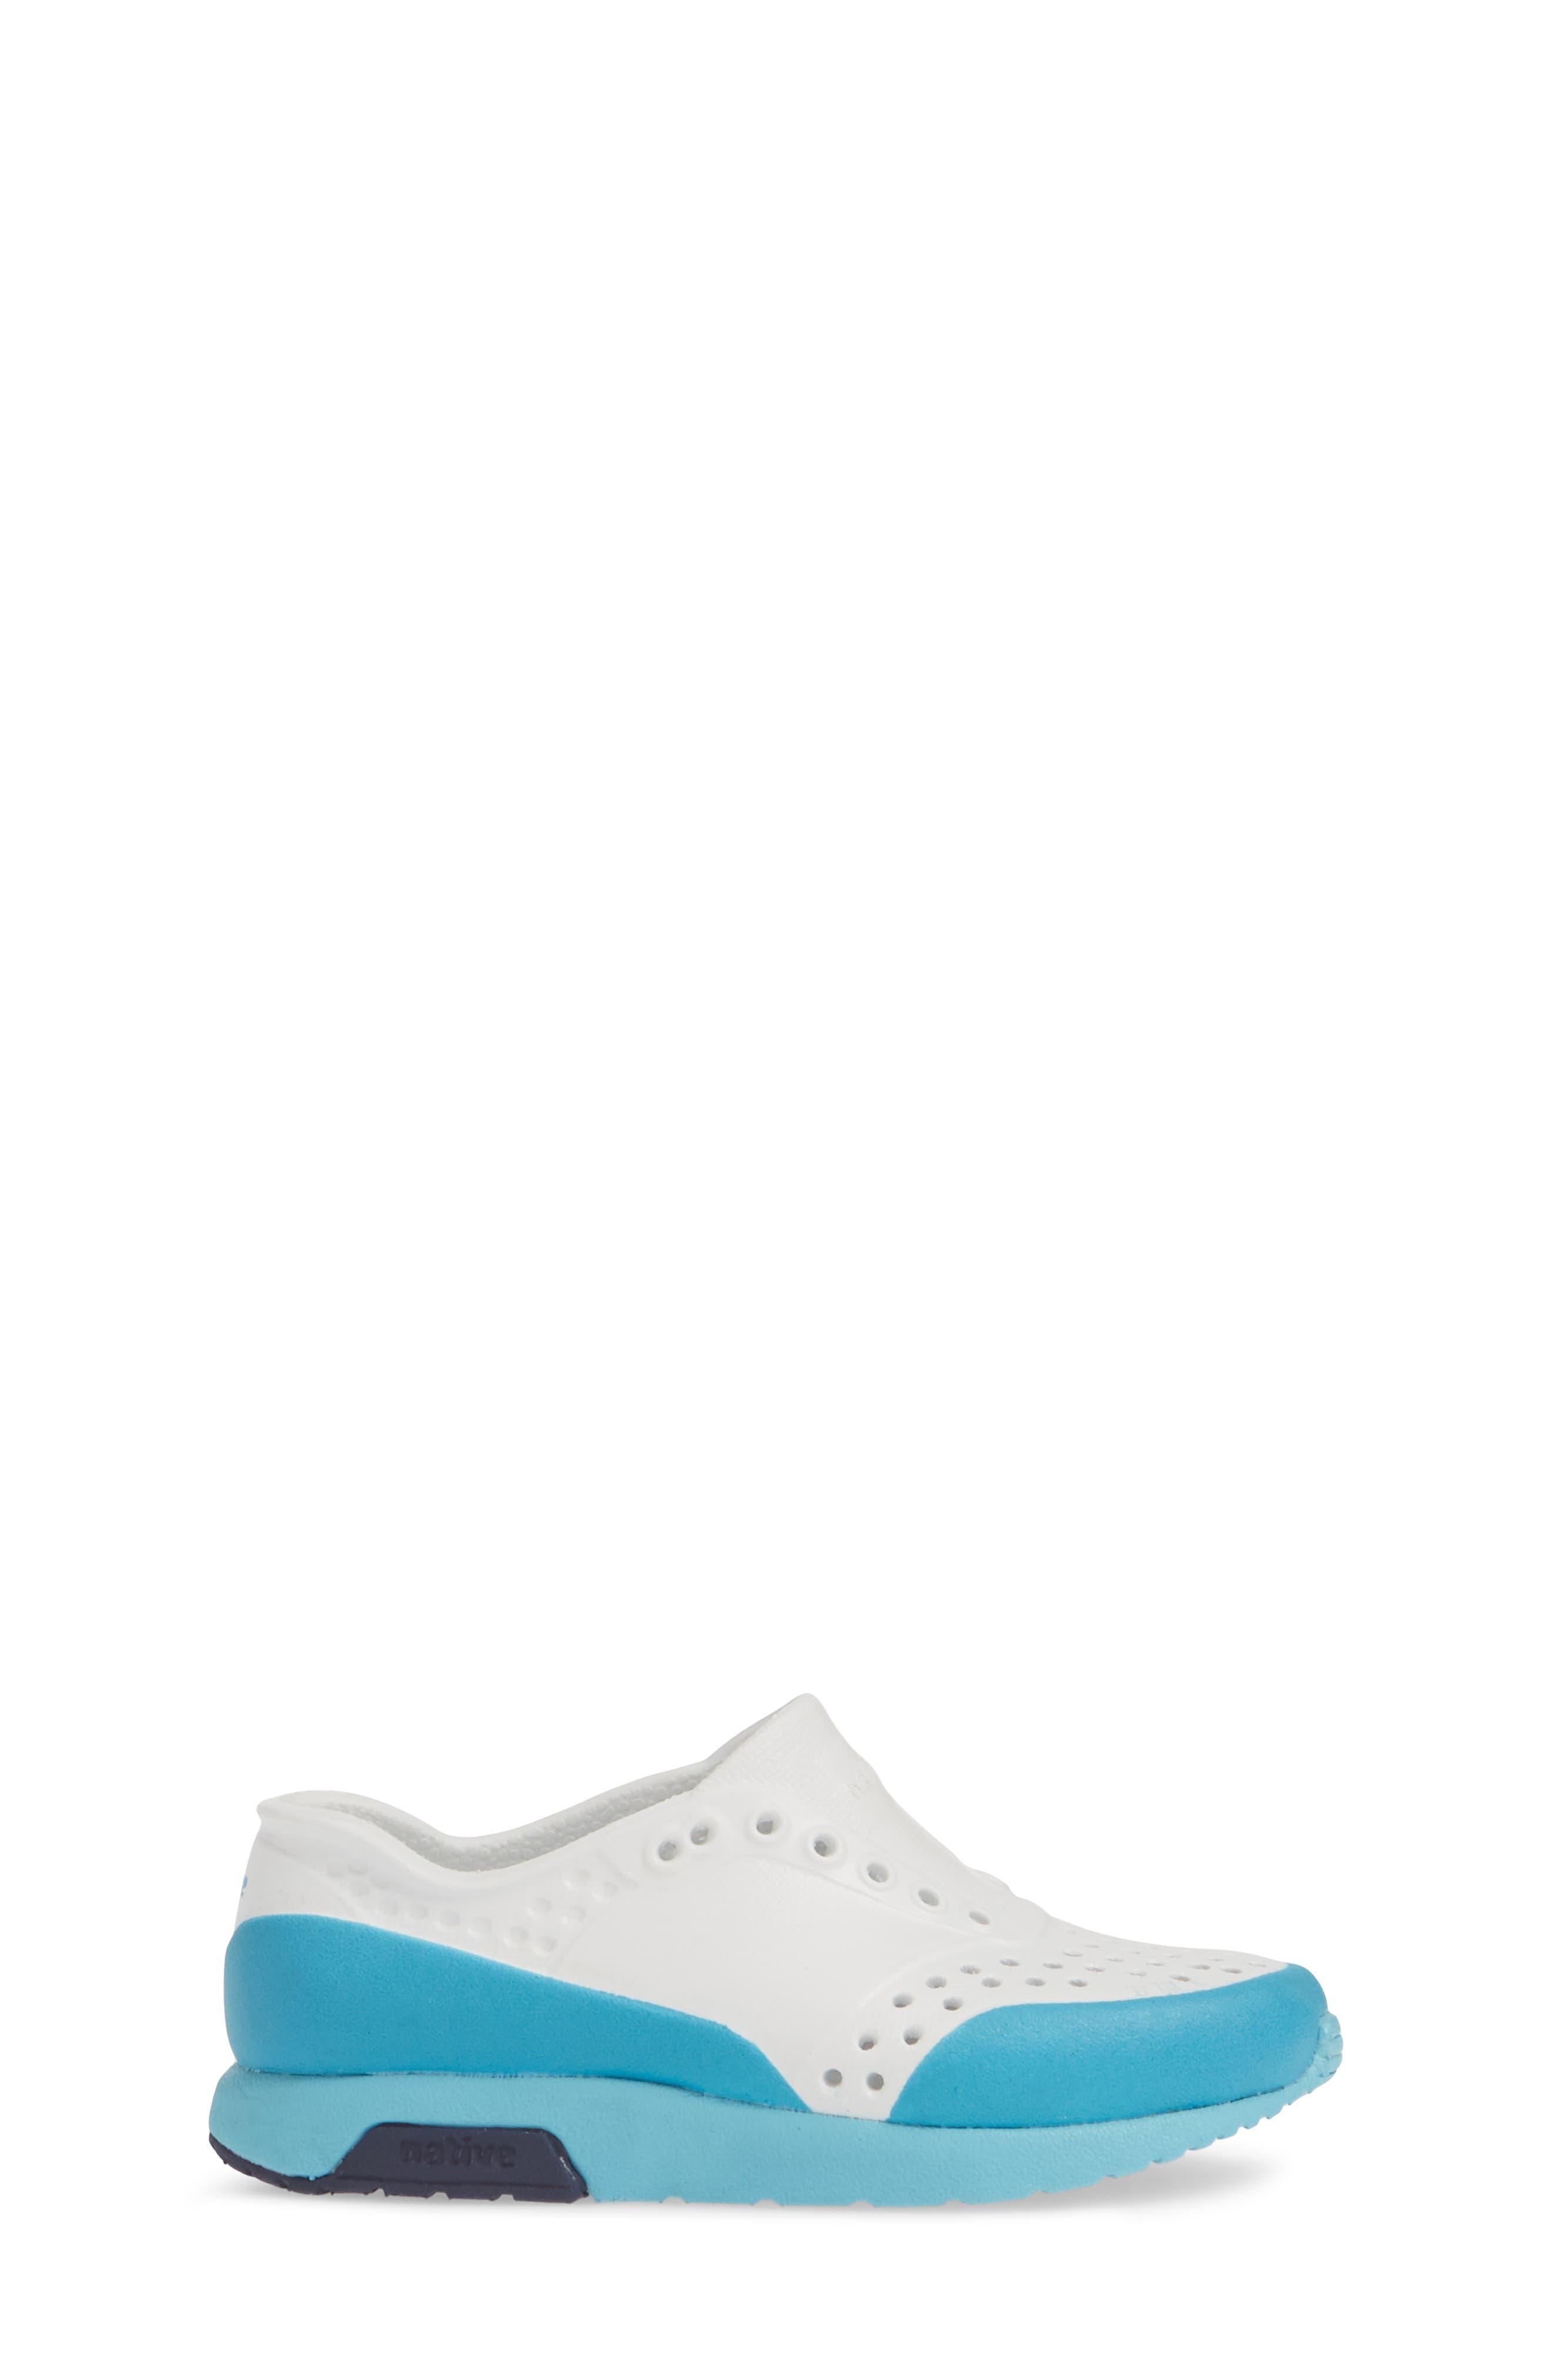 NATIVE SHOES, Lennox Block Slip-On Sneaker, Alternate thumbnail 3, color, 438